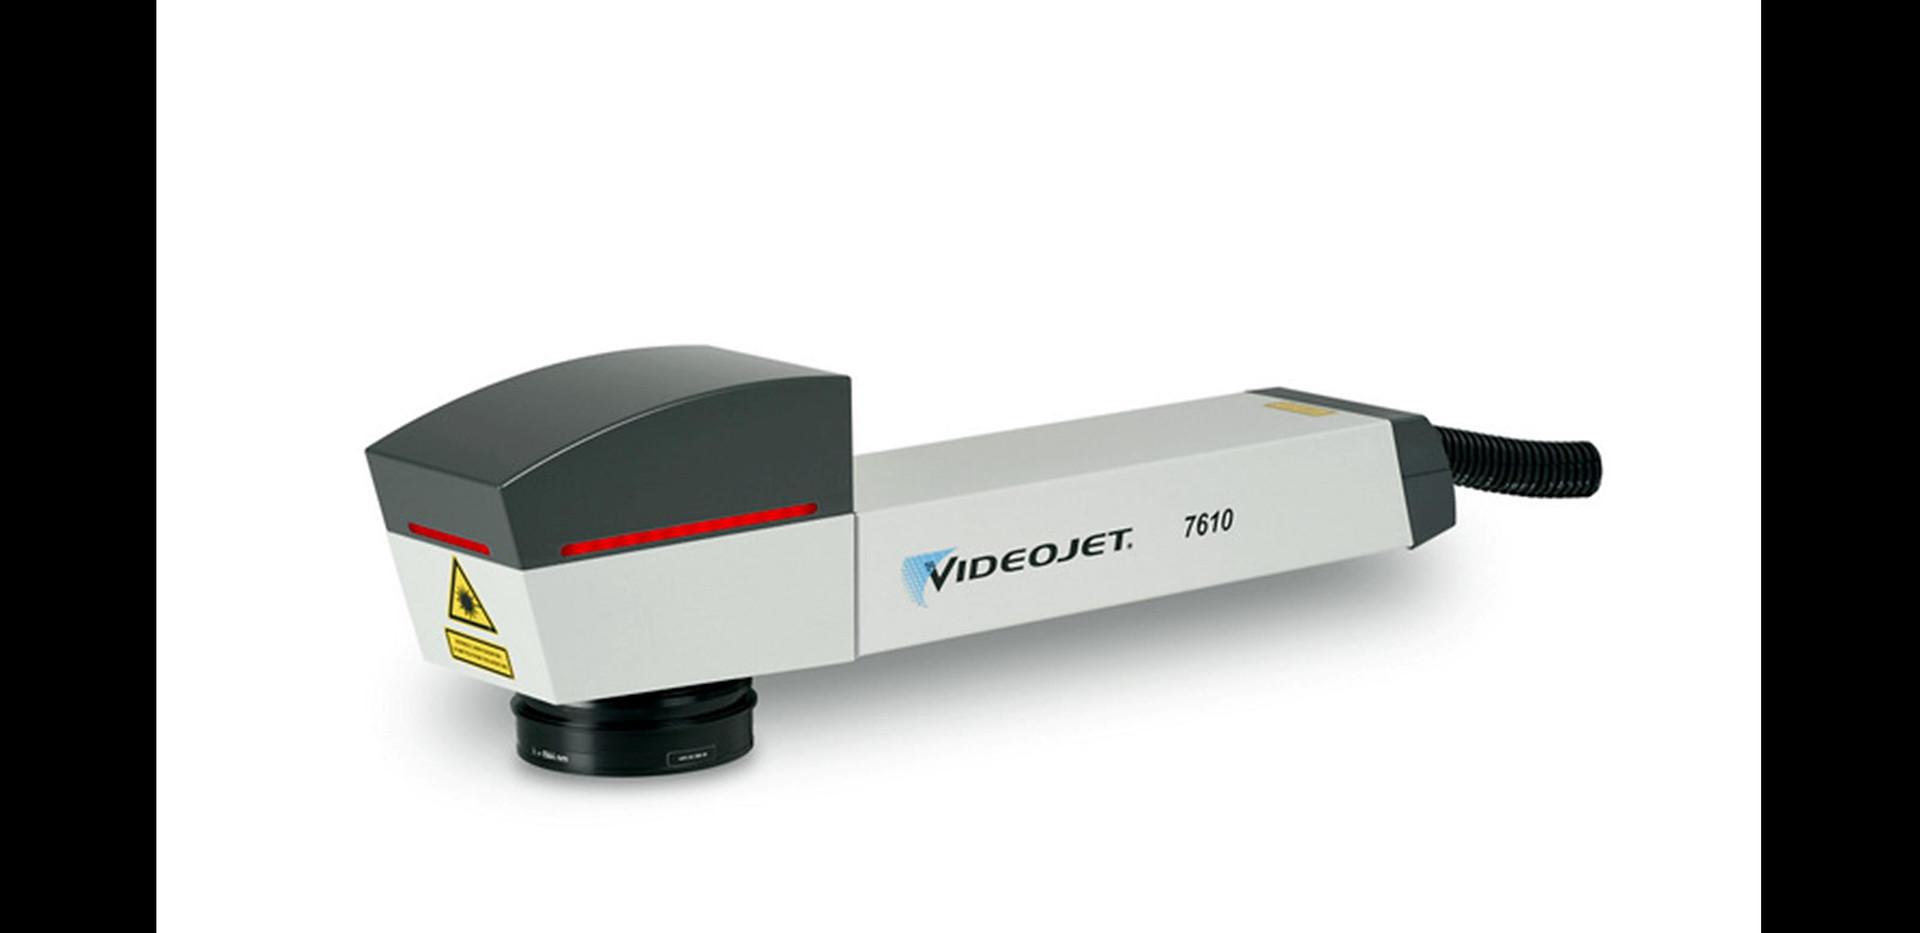 VJ7610 printhead